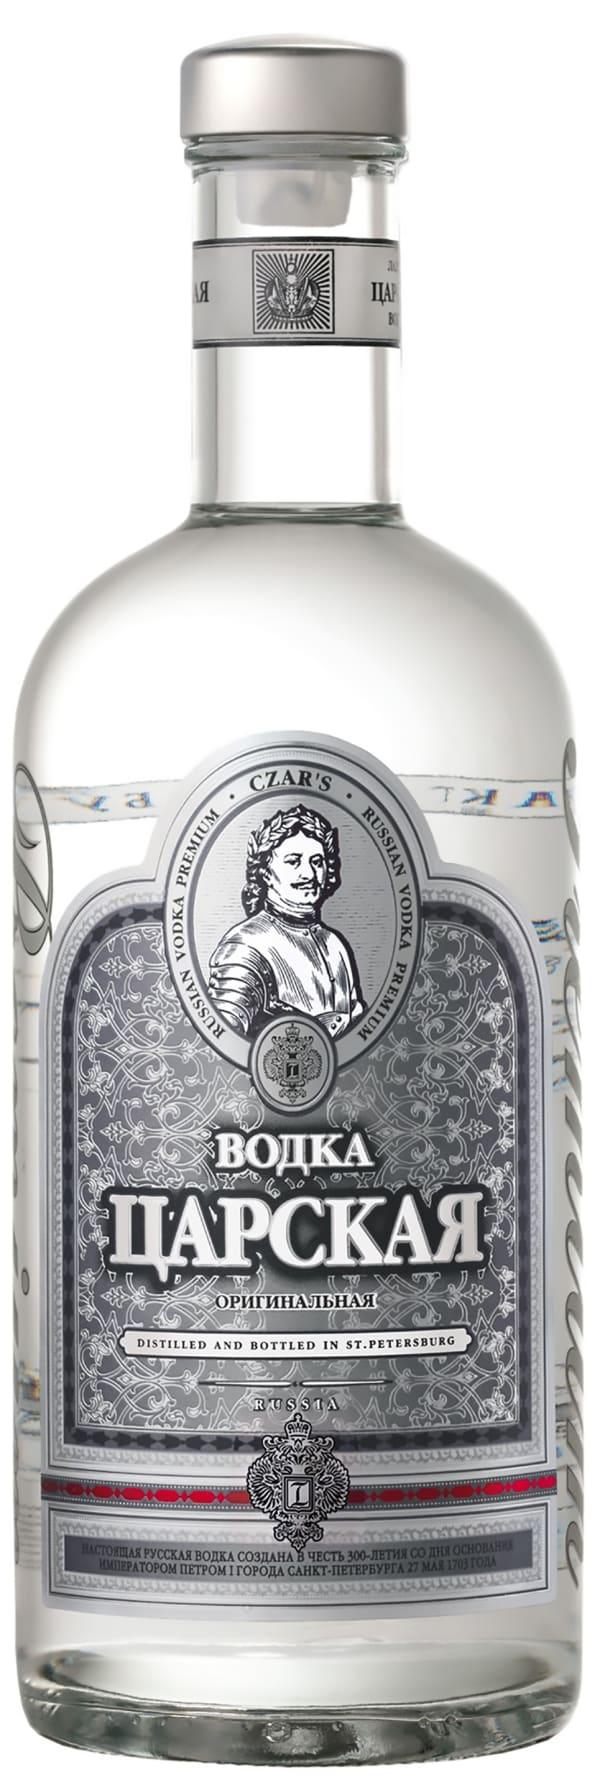 Czar's Russian Vodka